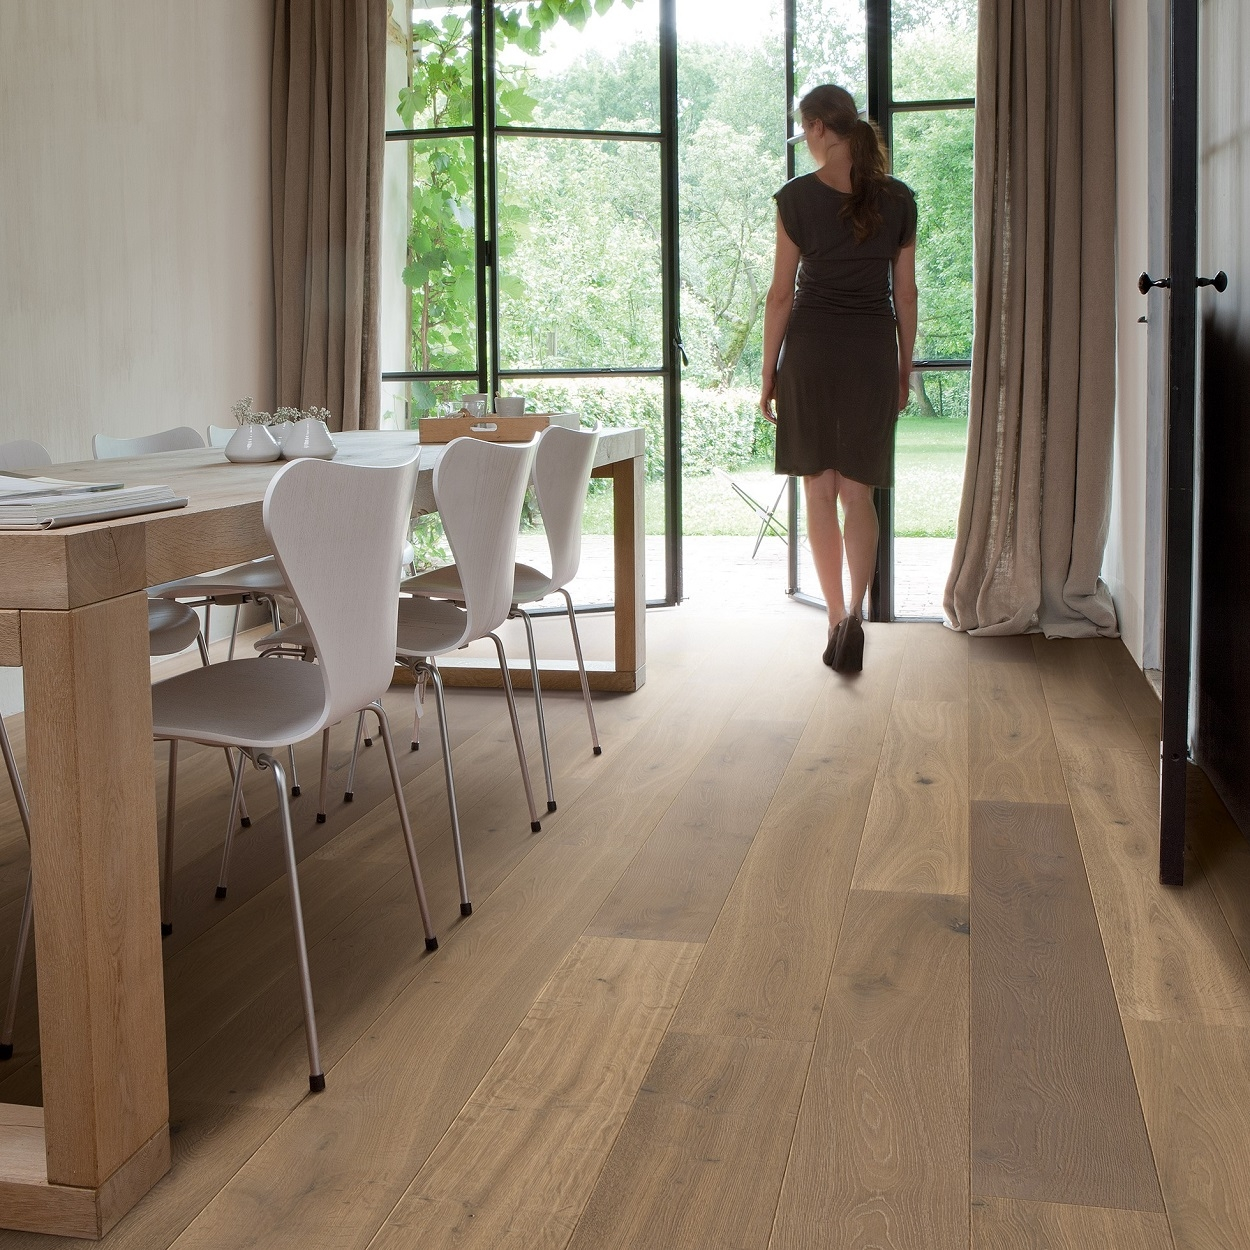 Quickstep Palazzo Latte Oak Oiled Engineered Wood Flooring PAL3885S